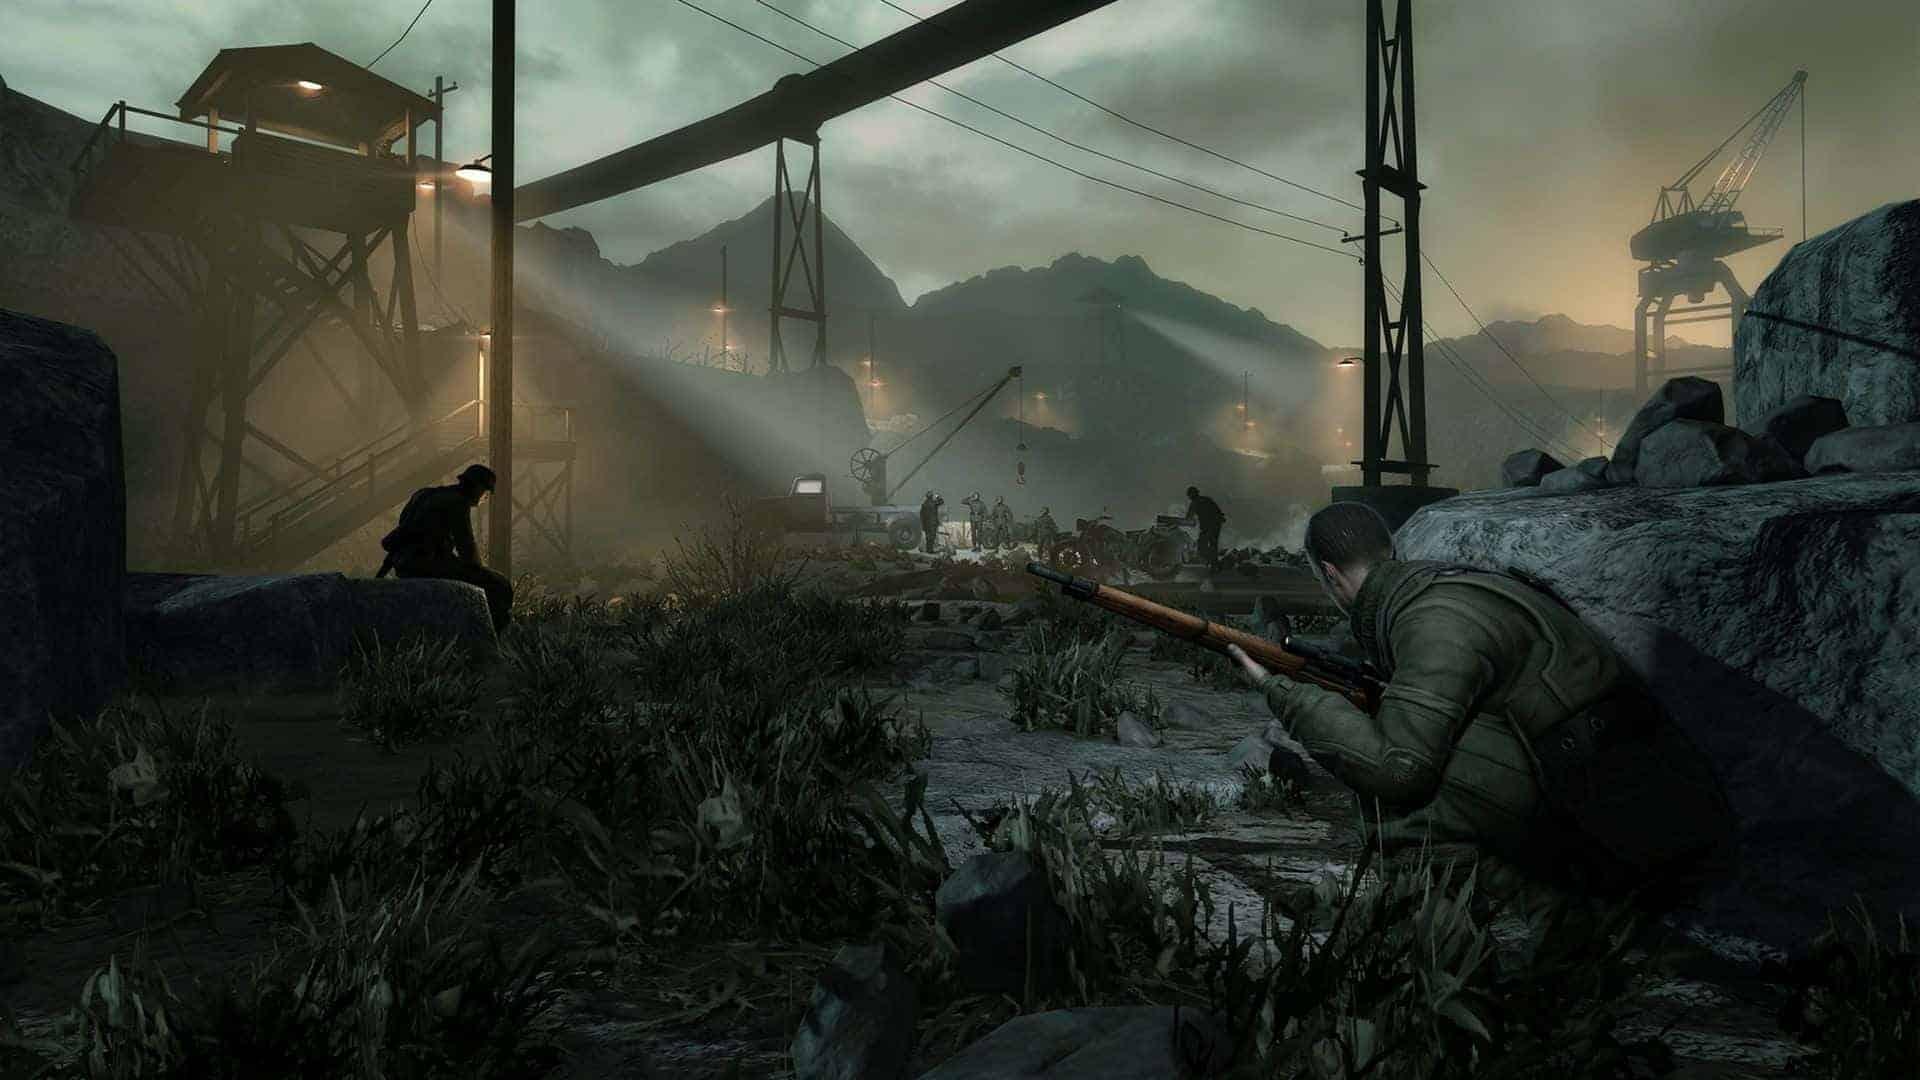 free download game sniper elite v2 full version for pc